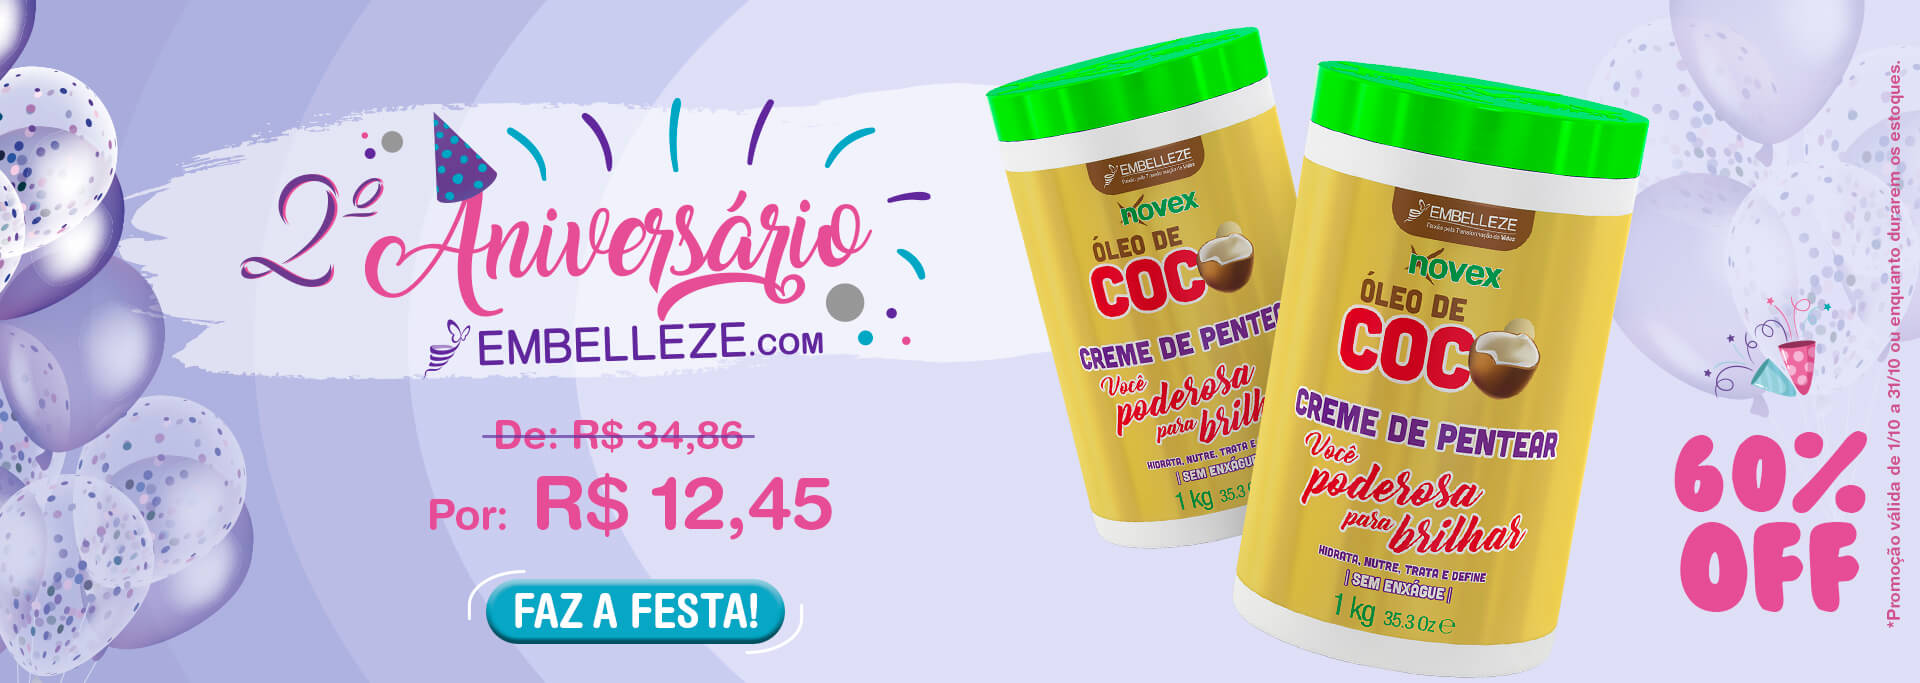 Fullbanner Coco